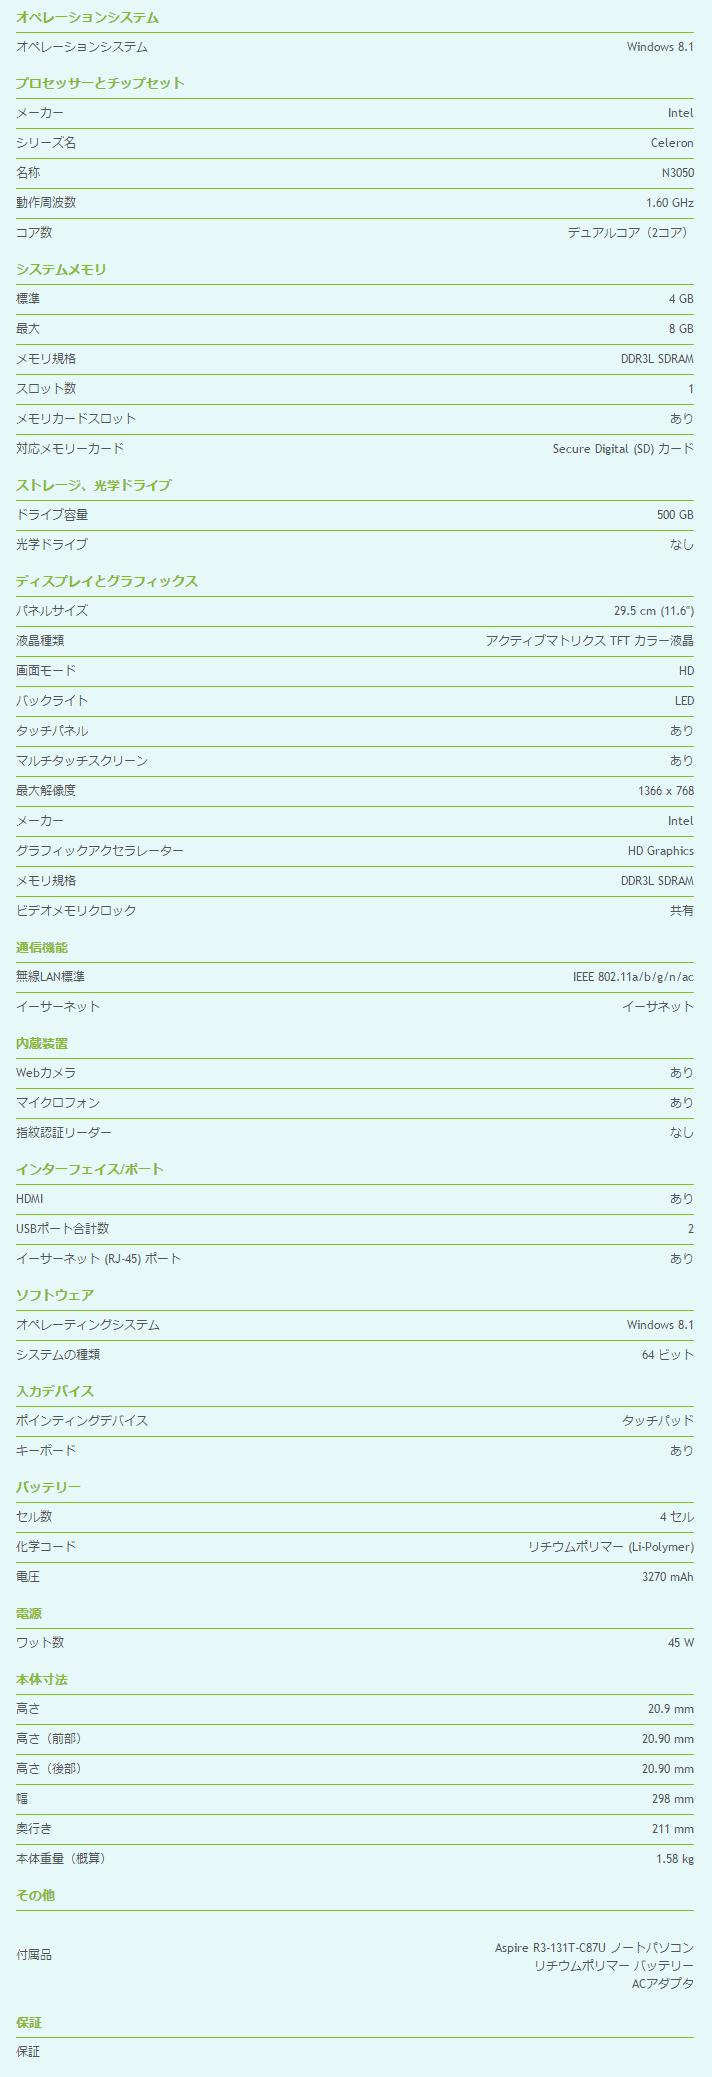 acer Aspire R11 スペック表